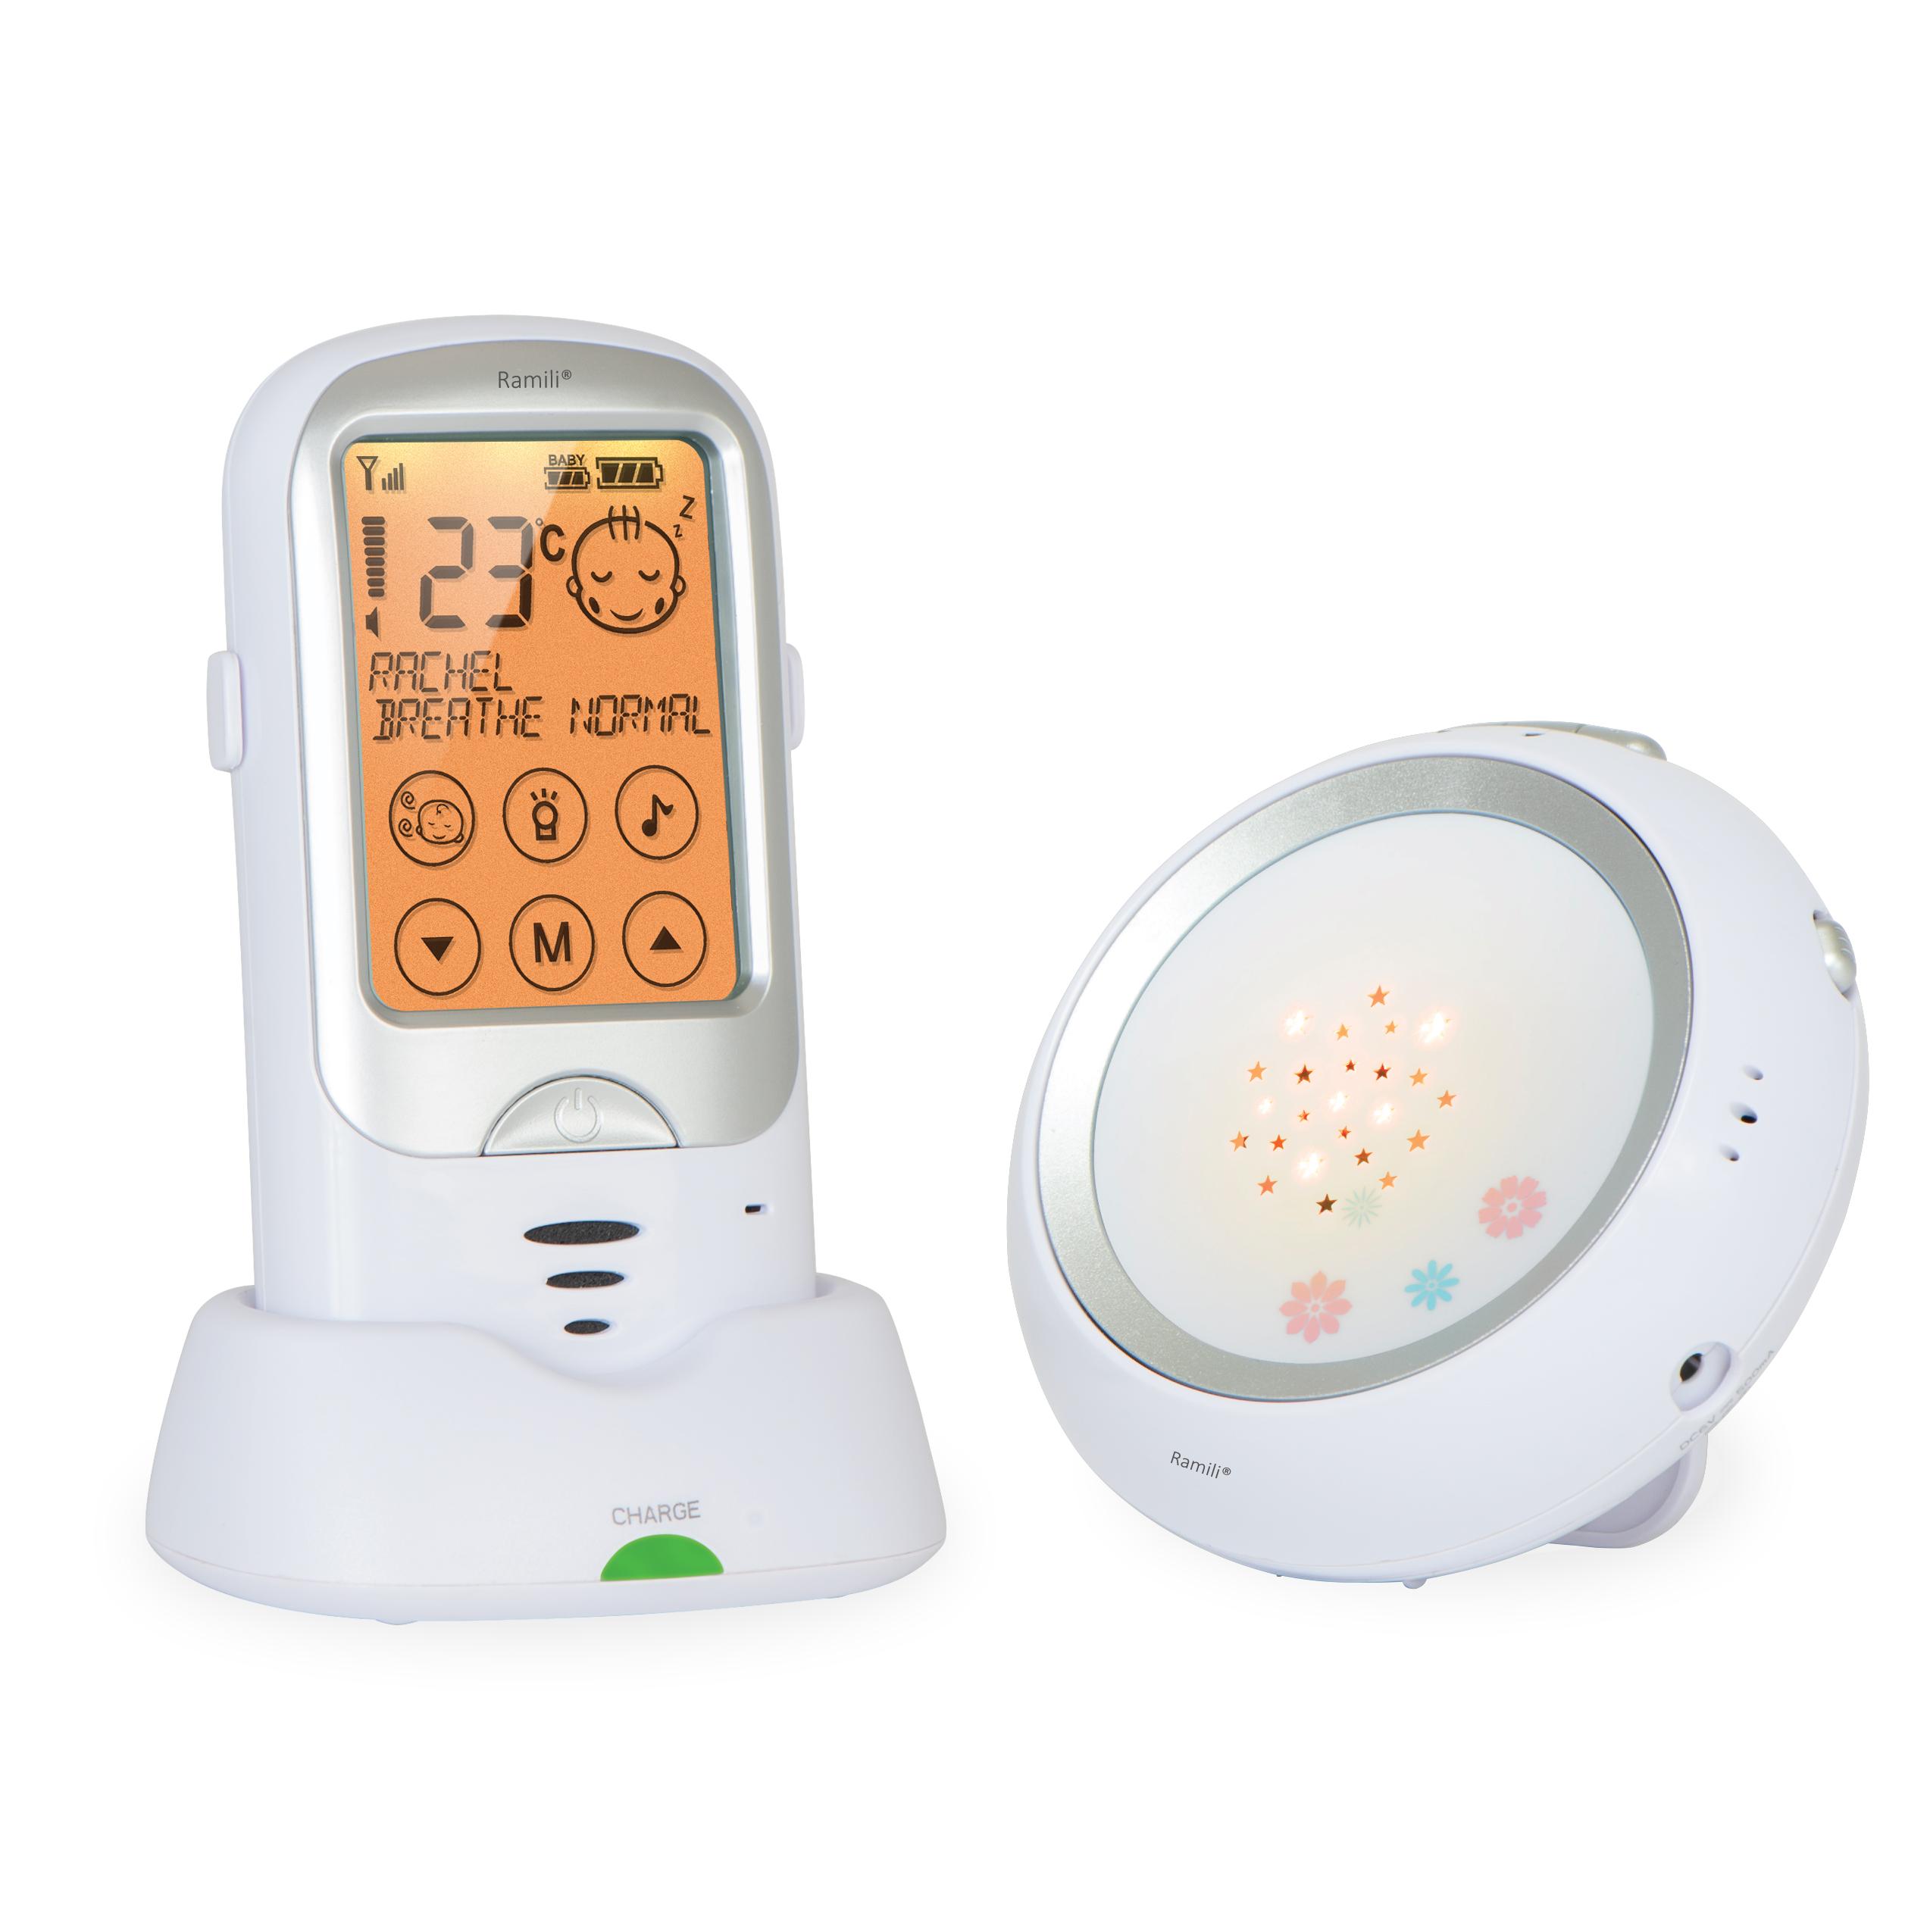 Радио-няня Ramili Baby RA300 -  Безопасность ребенка